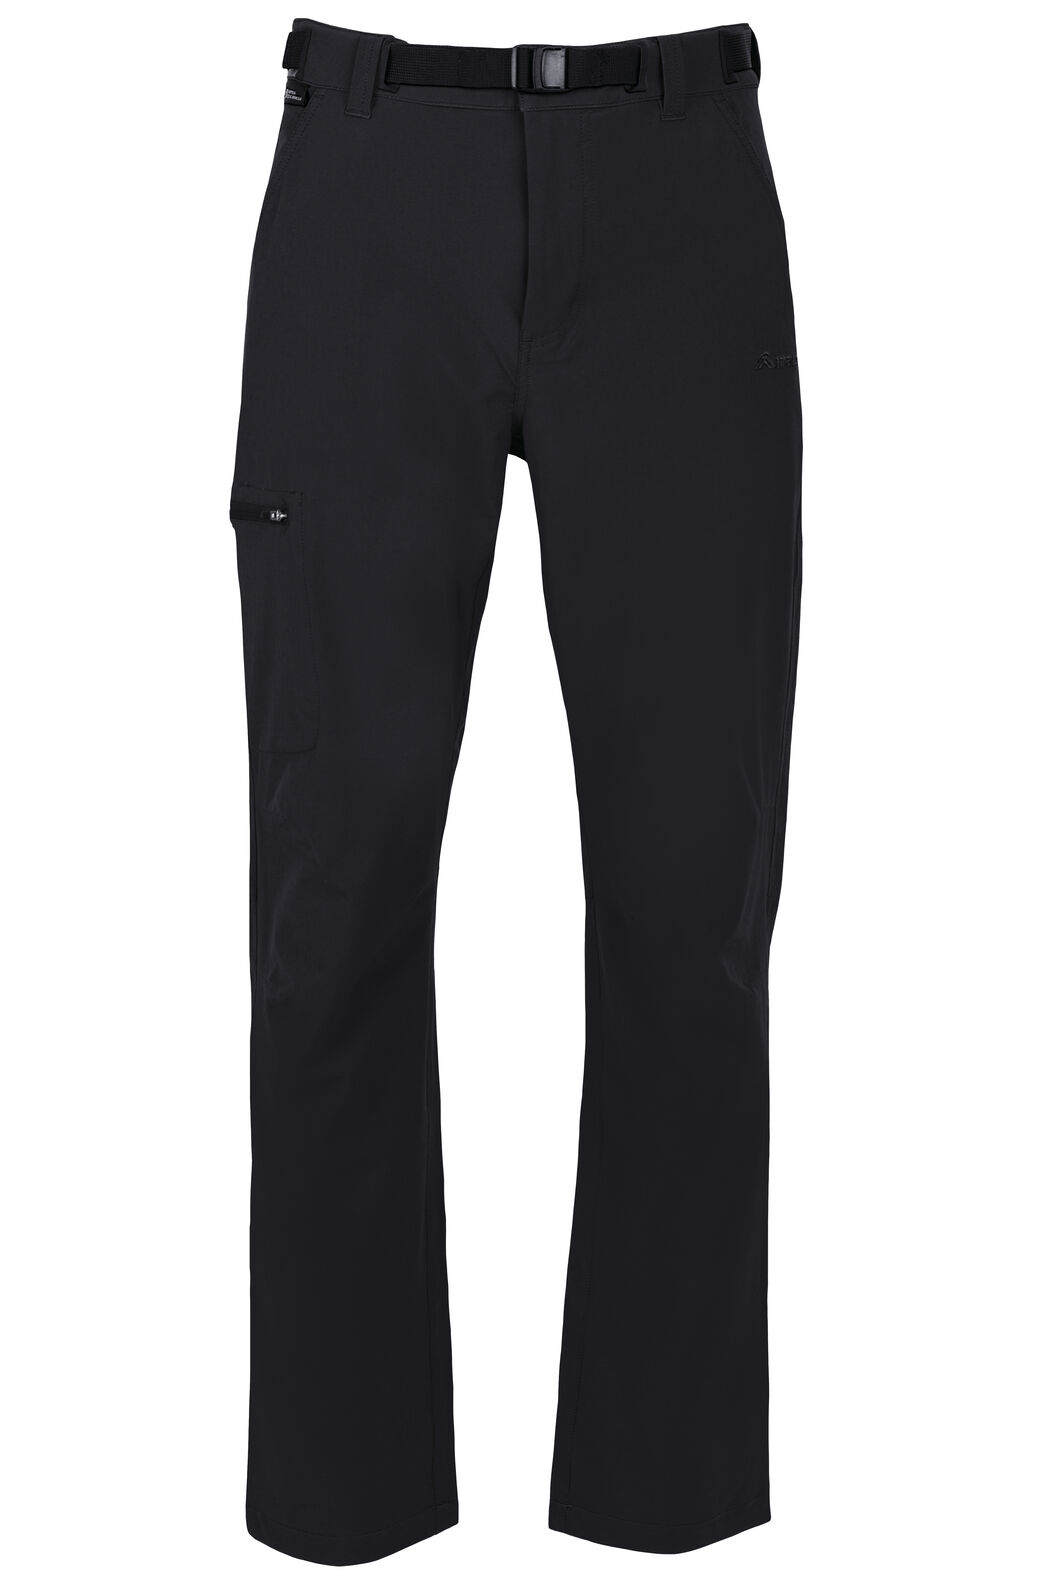 Macpac Trekker Pertex® Equilibrium Softshell Pants — Men's, Black, hi-res